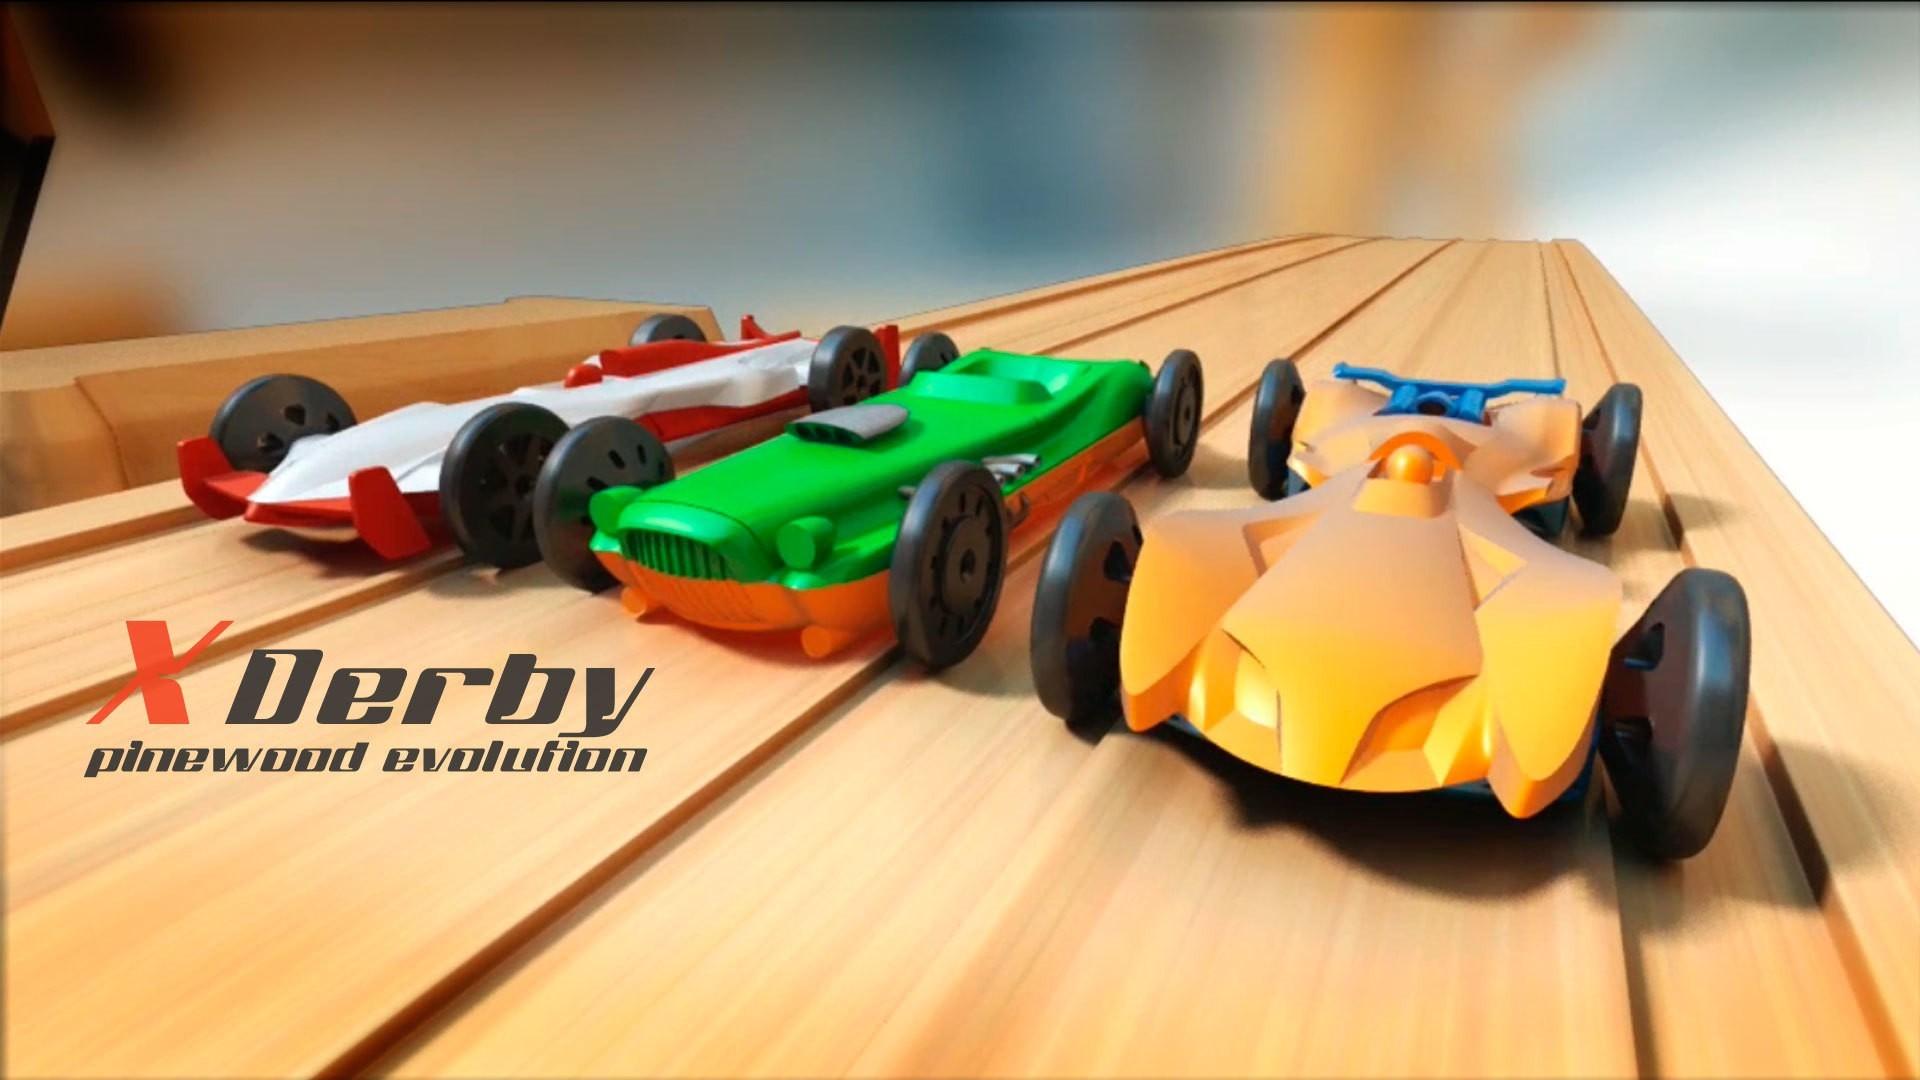 url1.jpg Download free STL file Dreamfactory XDerby • 3D printer template, yanizo